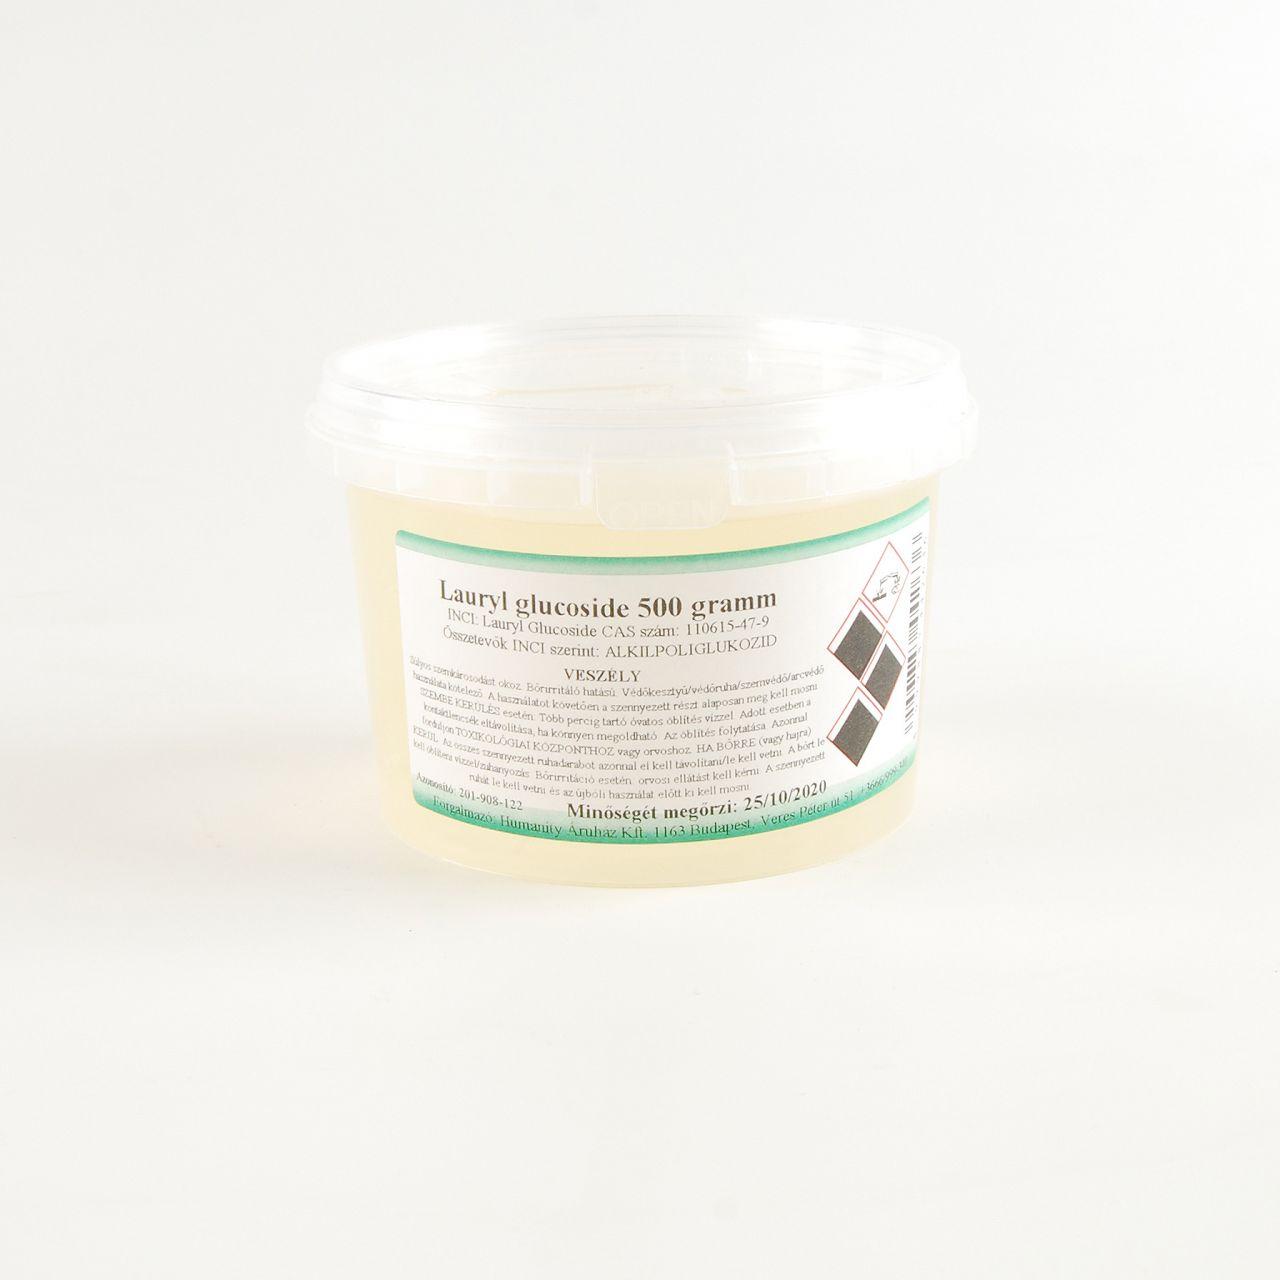 Lauryl Glucoside / Sűrítő tenzid 500 gramm